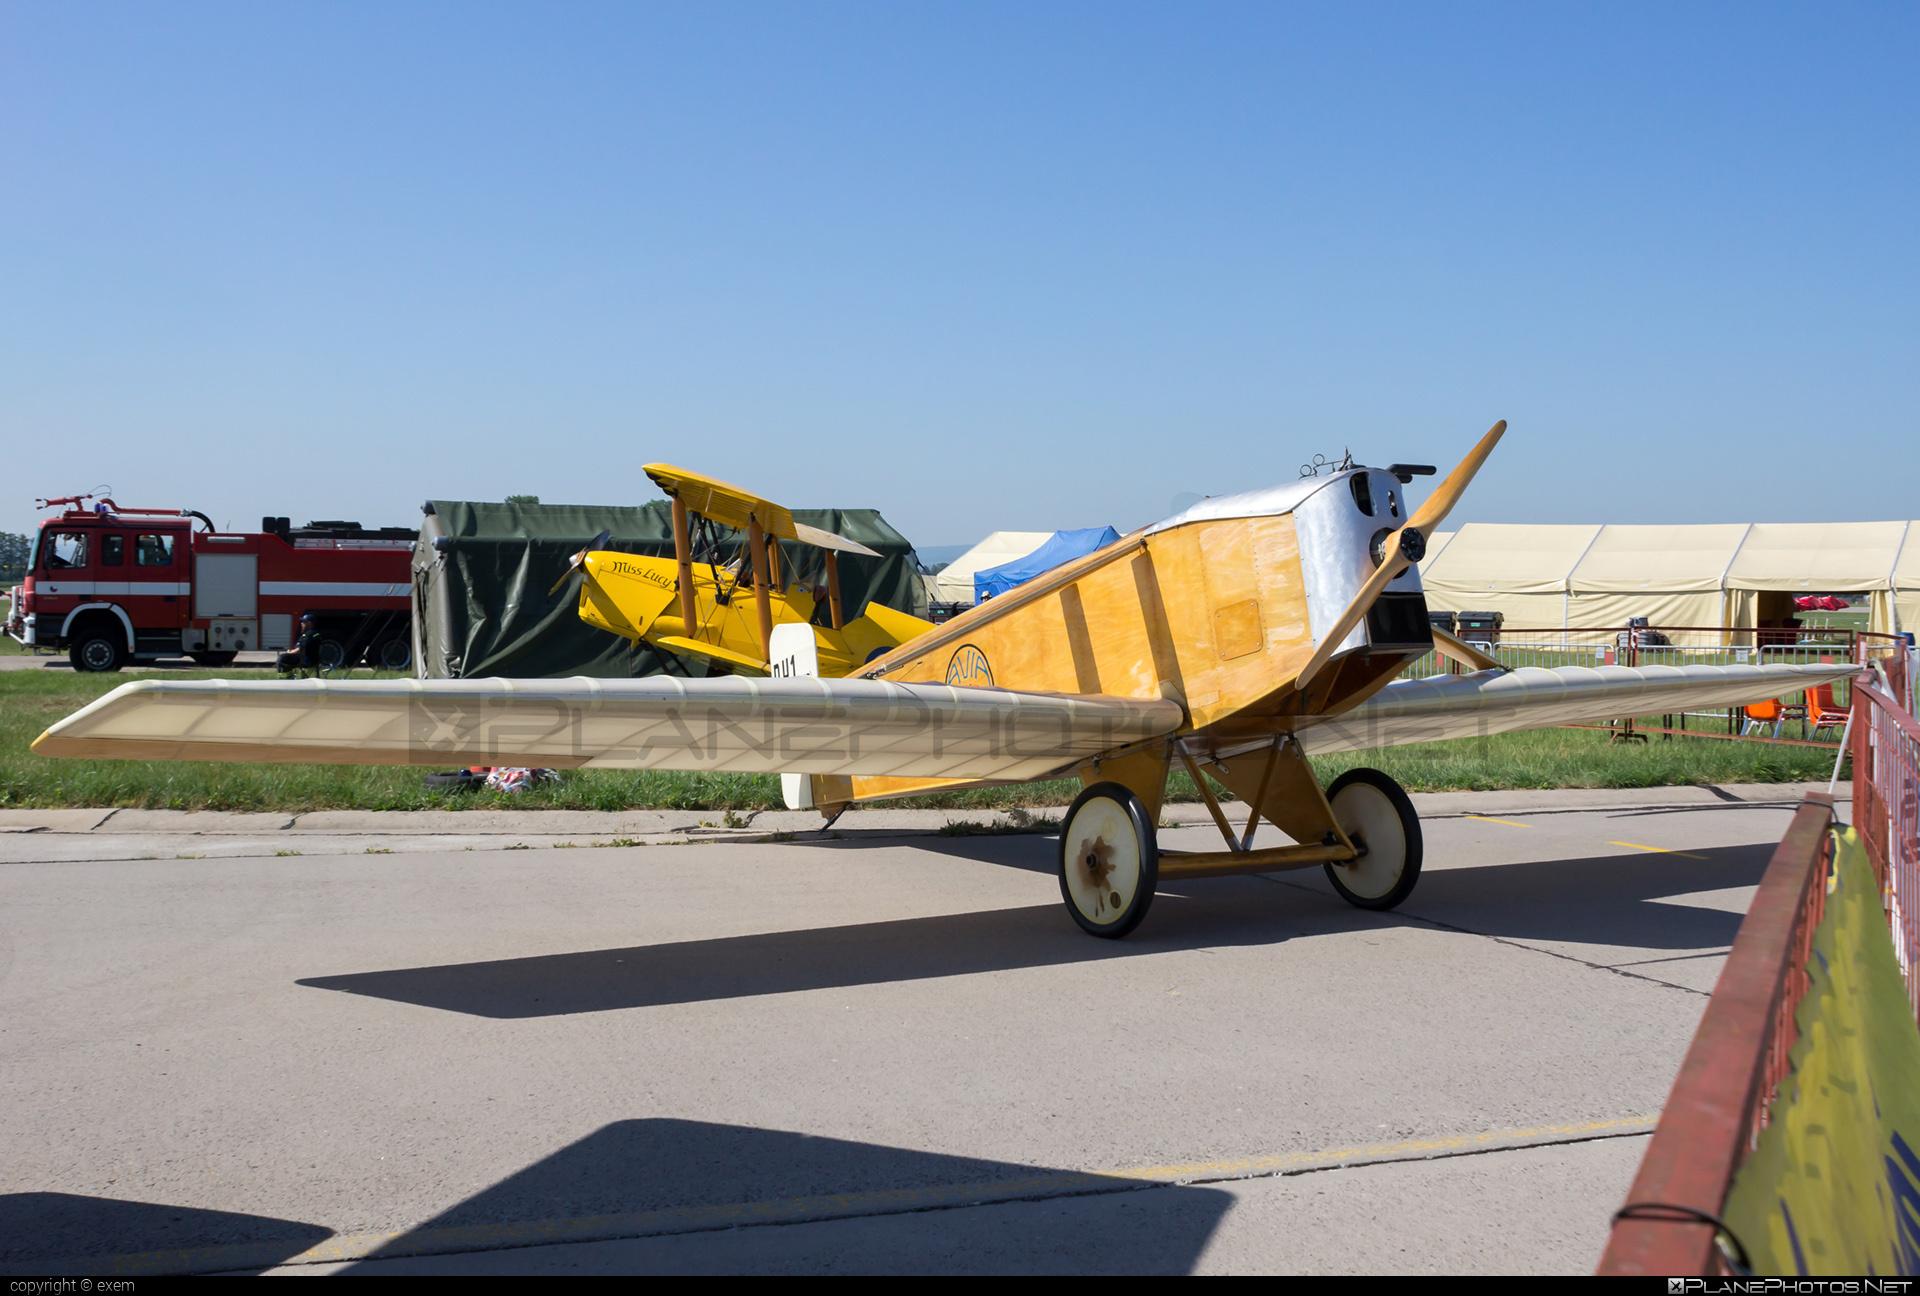 Avia BH.1 - OK-GUU 25 operated by Private operator #avia